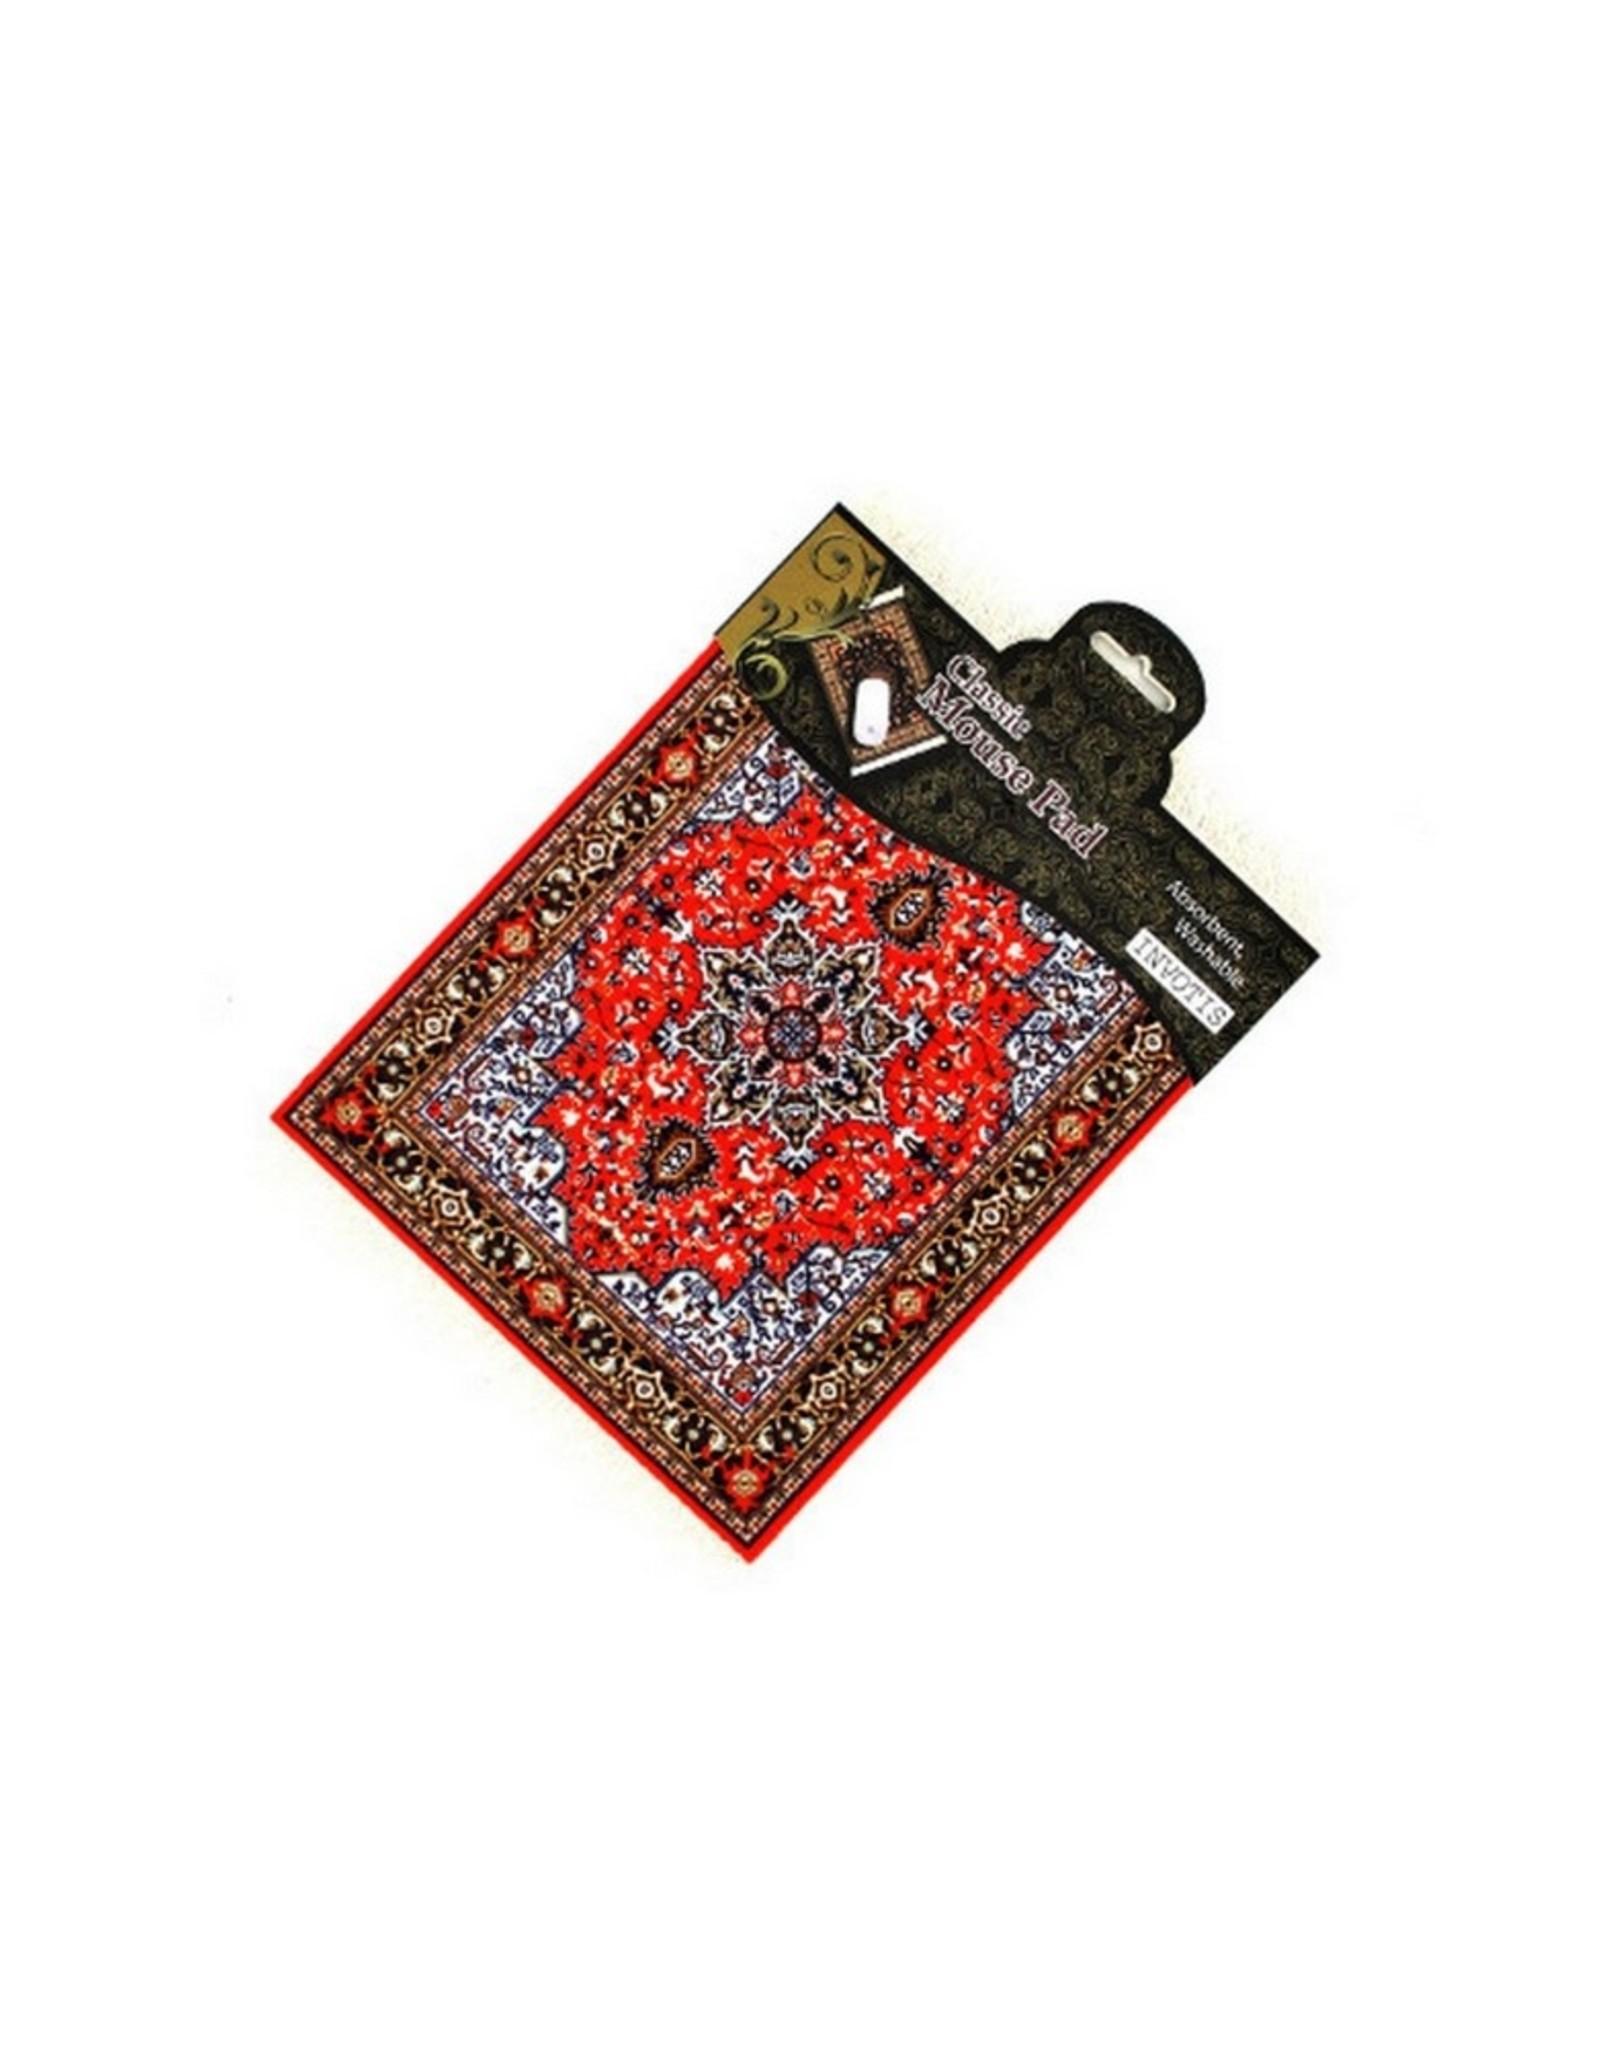 Invotis Muismat Perzisch Tapijt